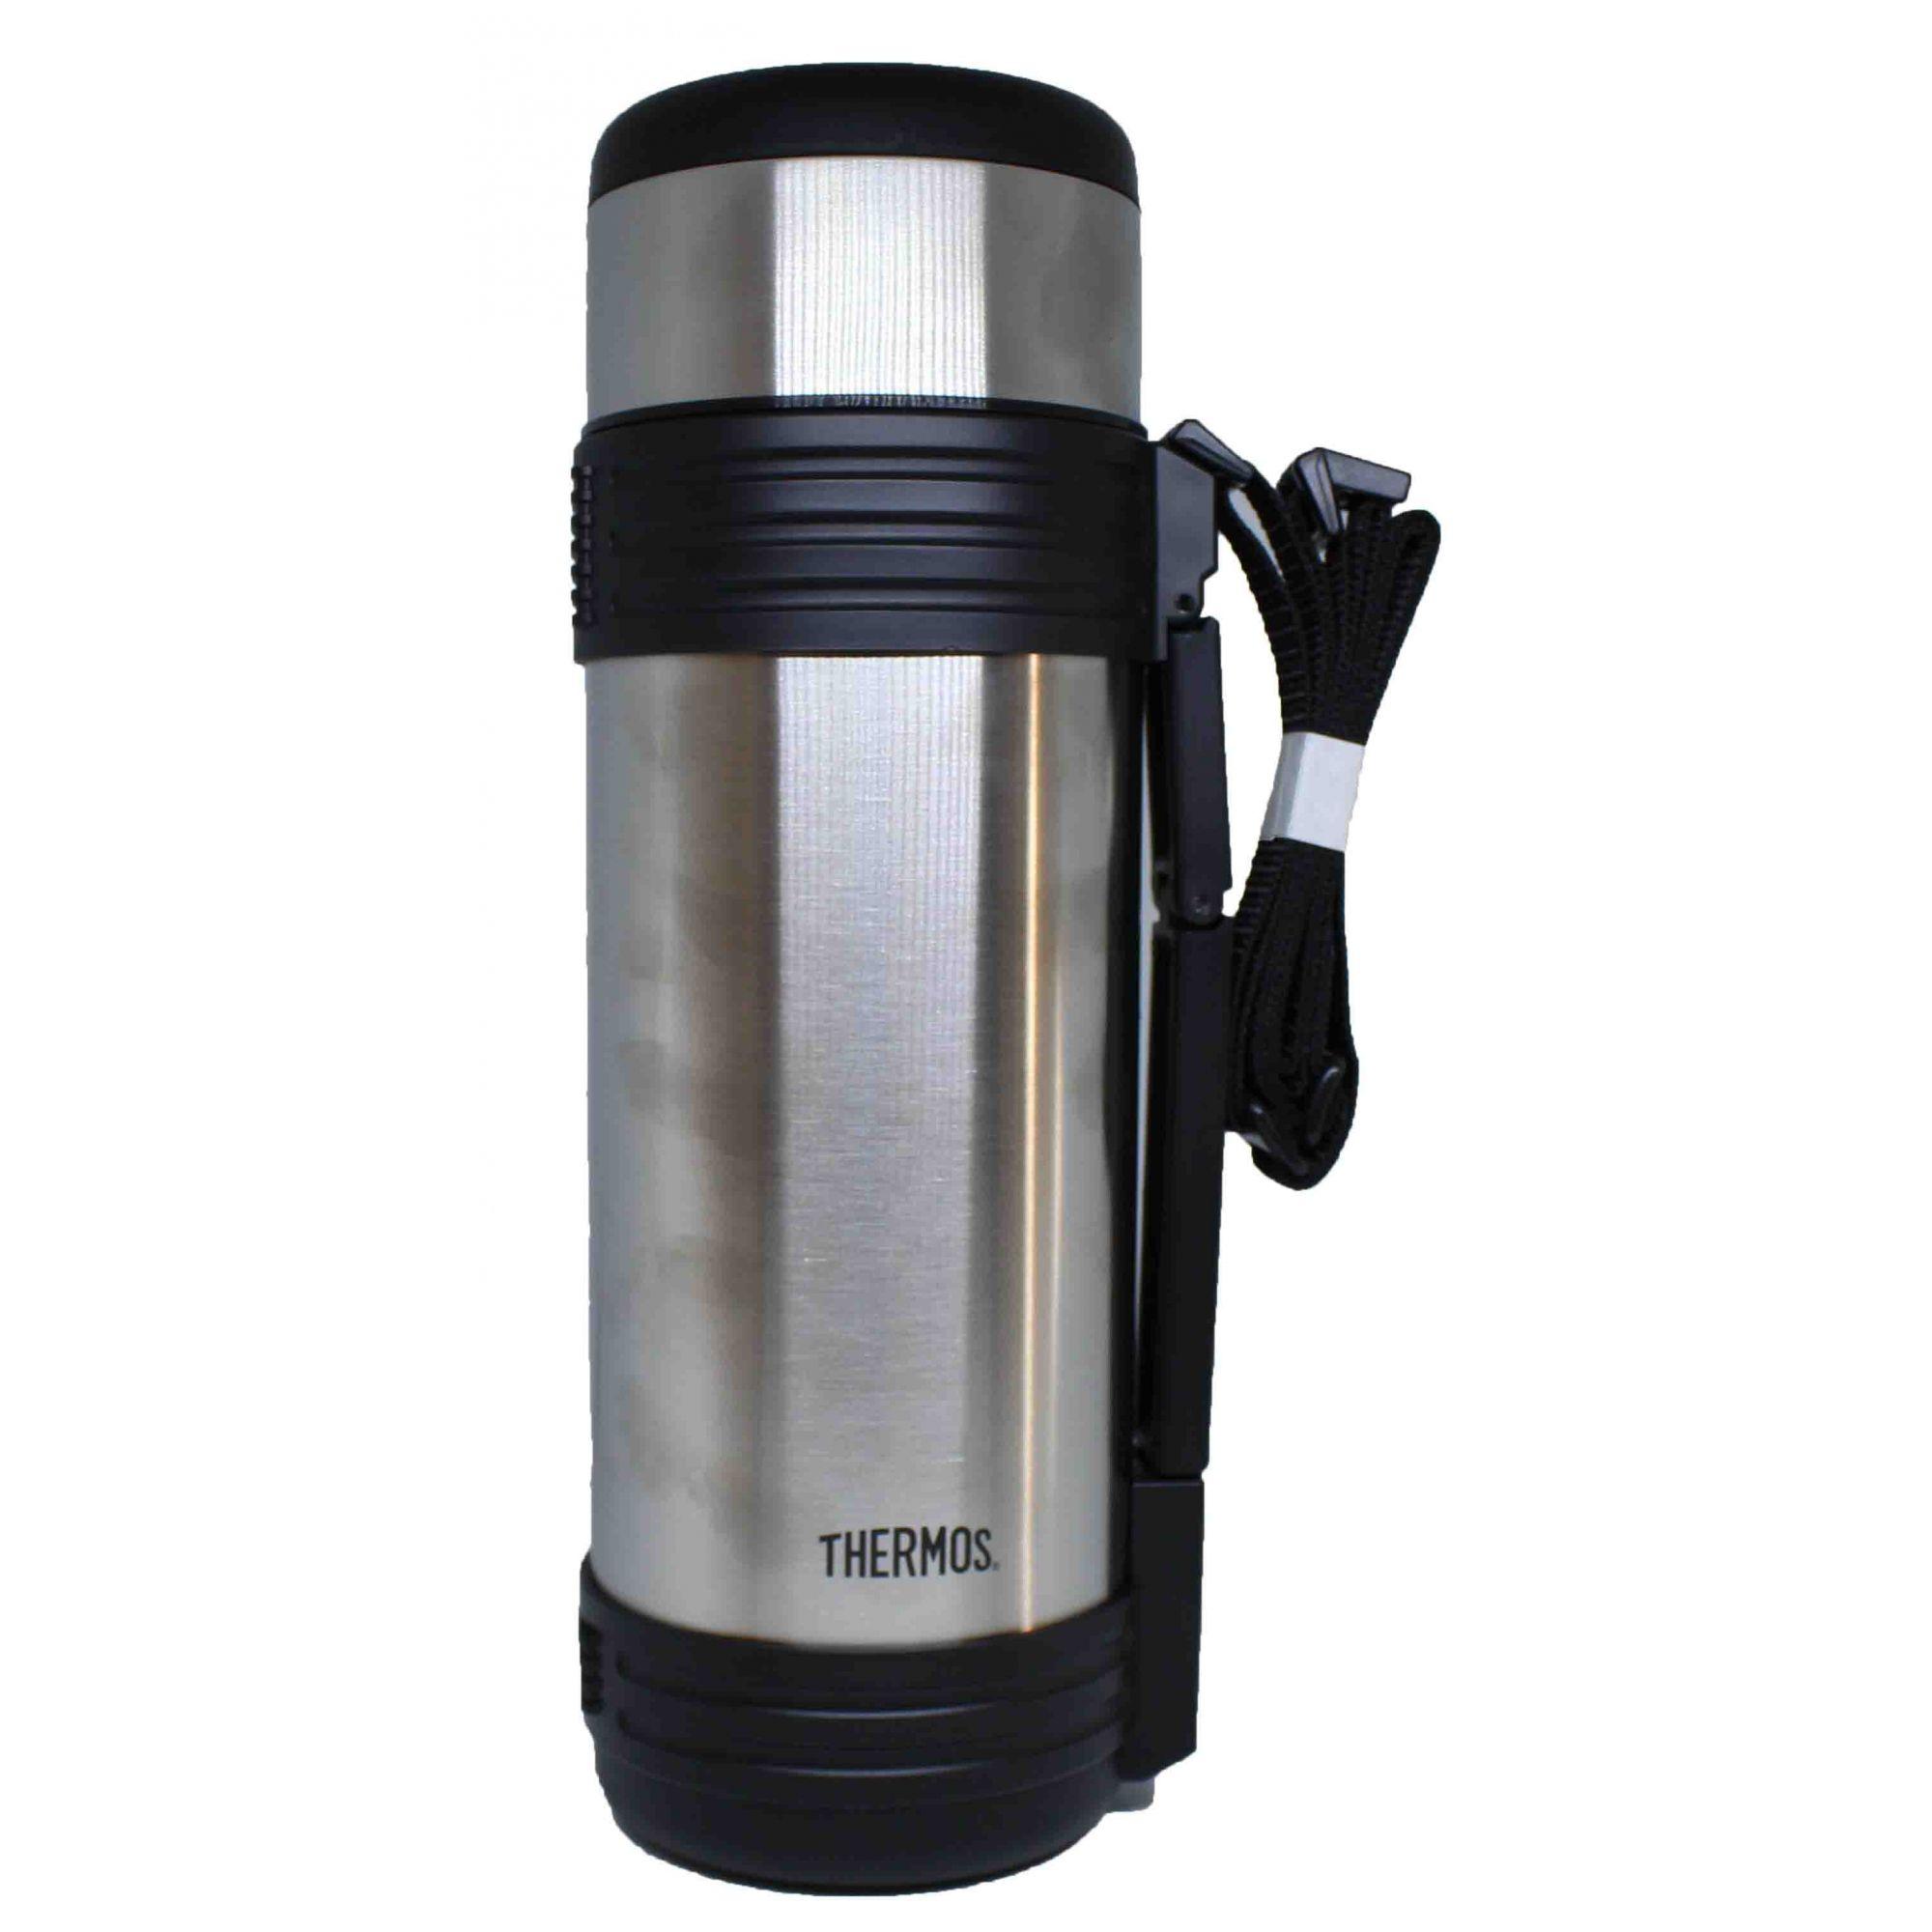 Garrafa Térmica K2 Prata (24h Quente ou Gelado)